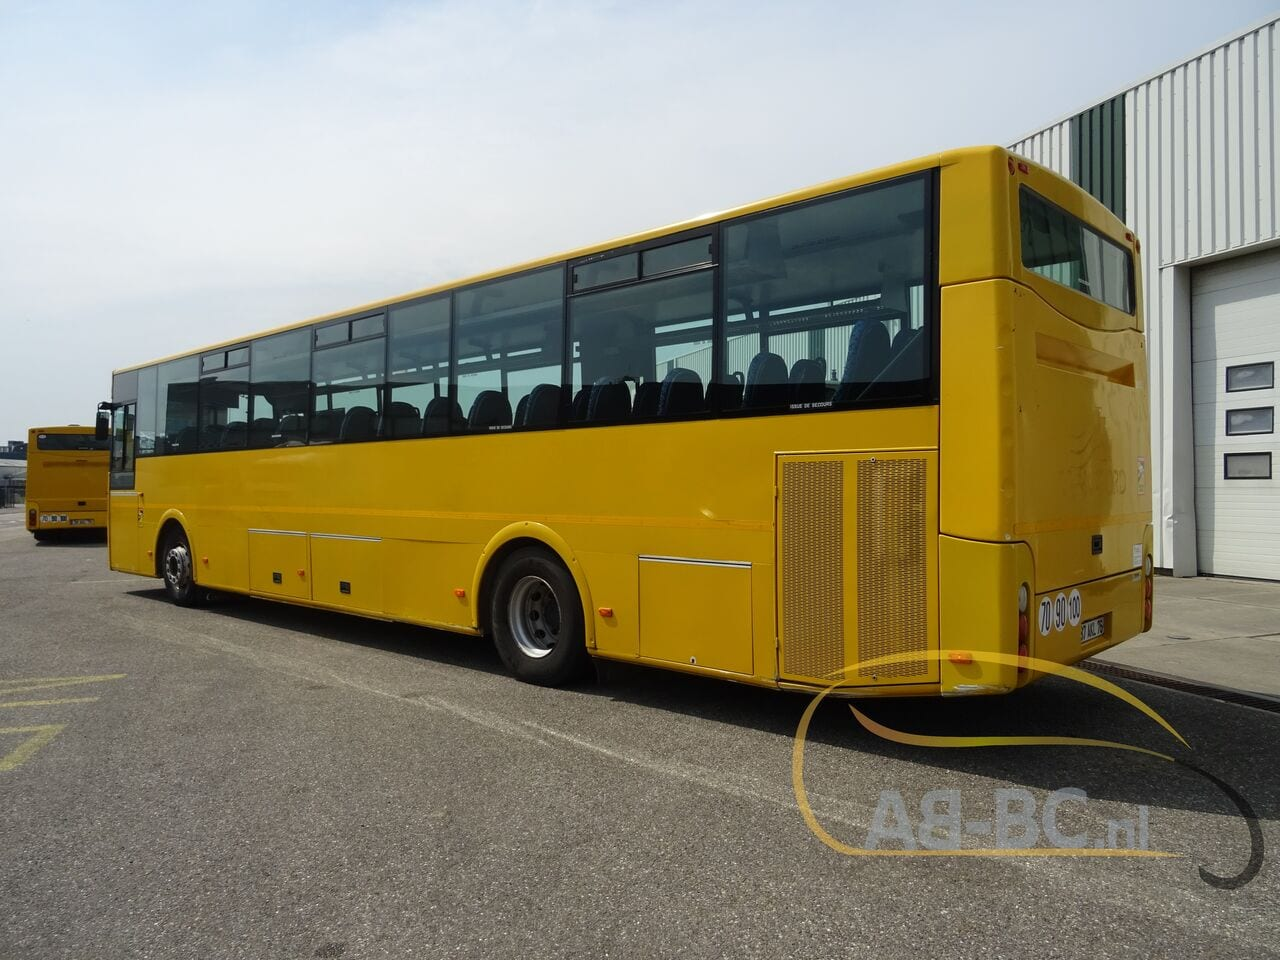 interurban-busMAN-Fast-64-seats---1619619720609018510_big_3bb343a96d87879f3e6afe023ed4e755--21042817163019598600